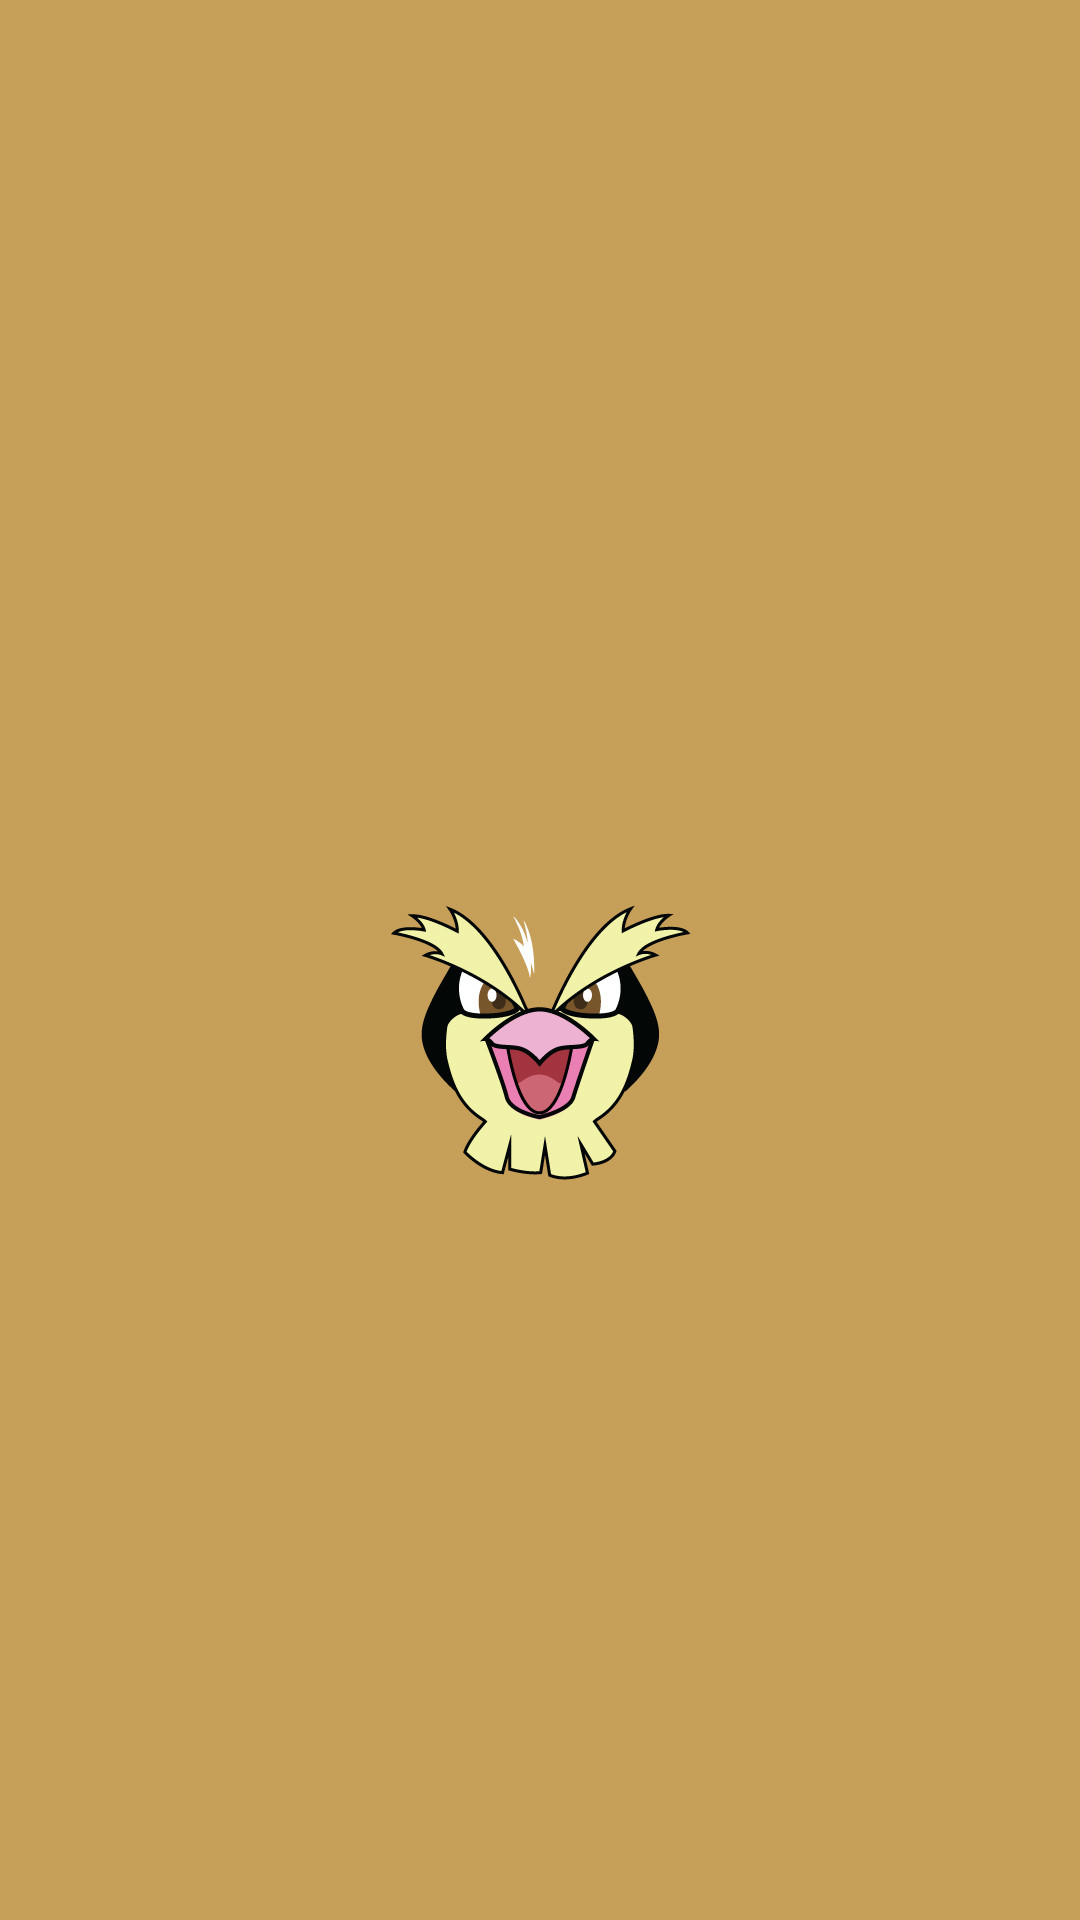 Pidgey Pokemon iPhone 6+ HD Wallpaper …